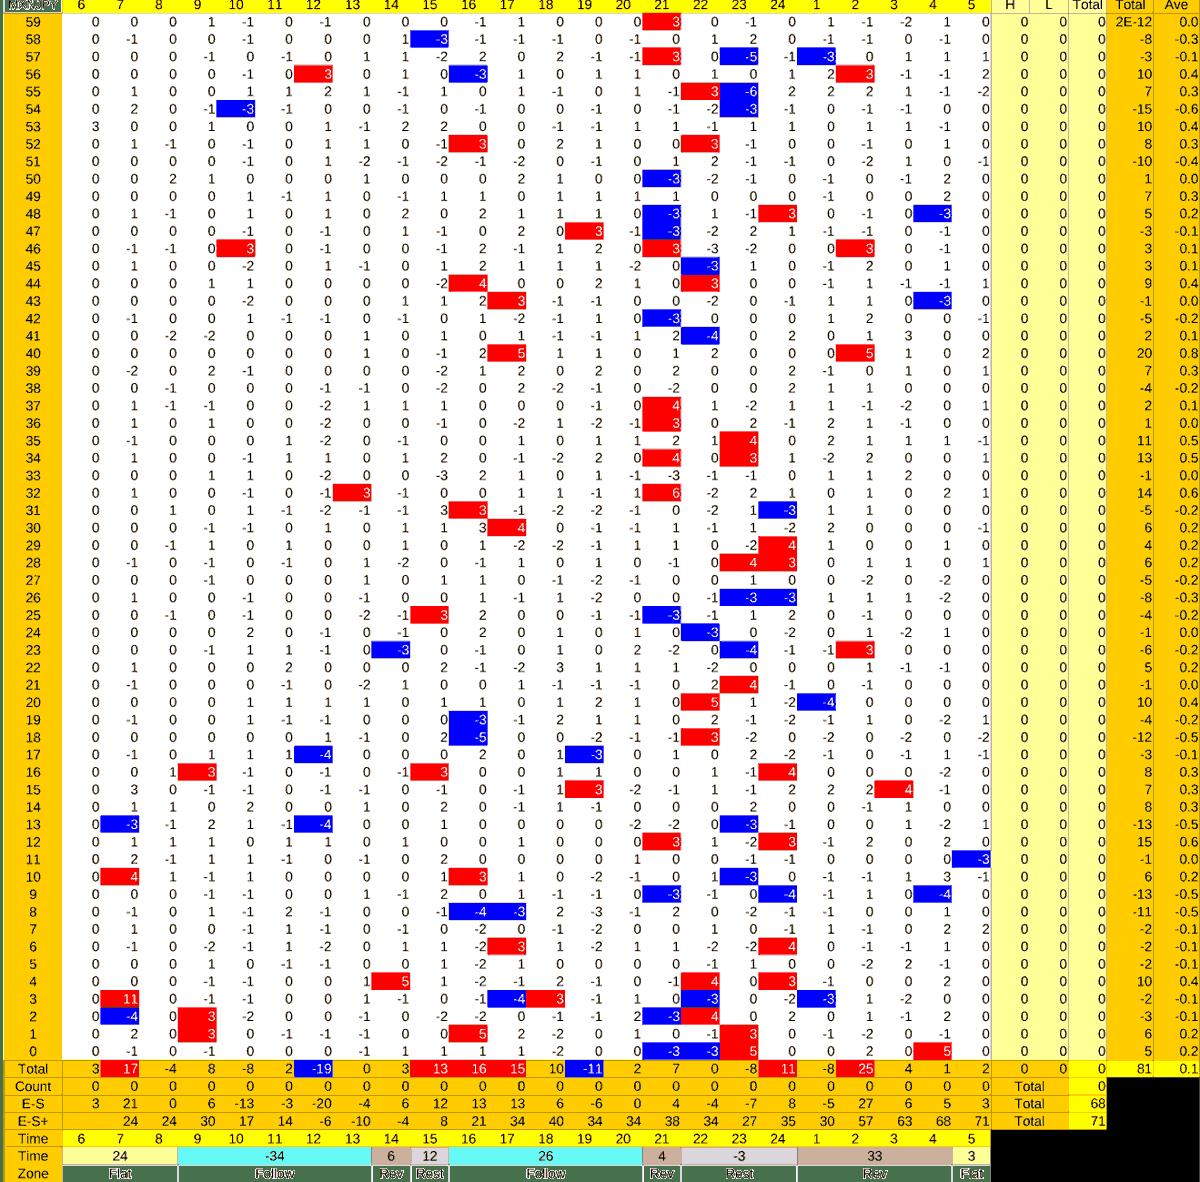 20210621_HS(3)MXNJPY